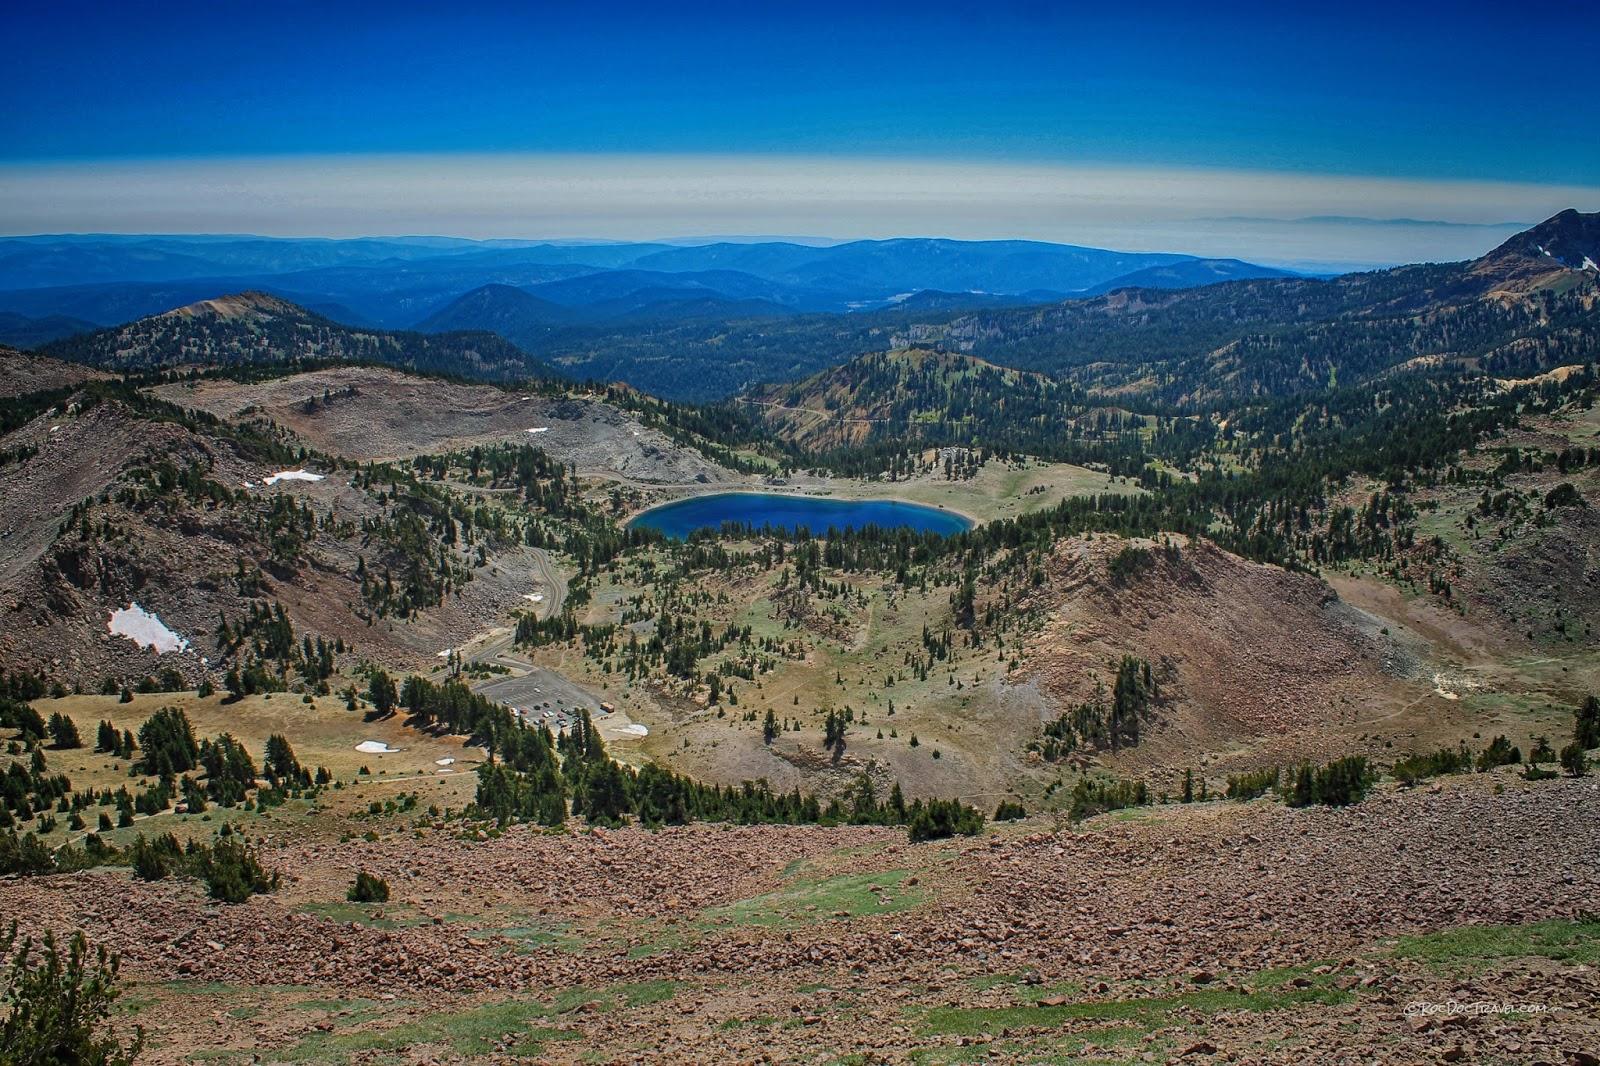 Lassen Volcanic National Park Cascades volcano California eruption disaster lava hiking geology travel field trip photography copyright RocDocTravel.com